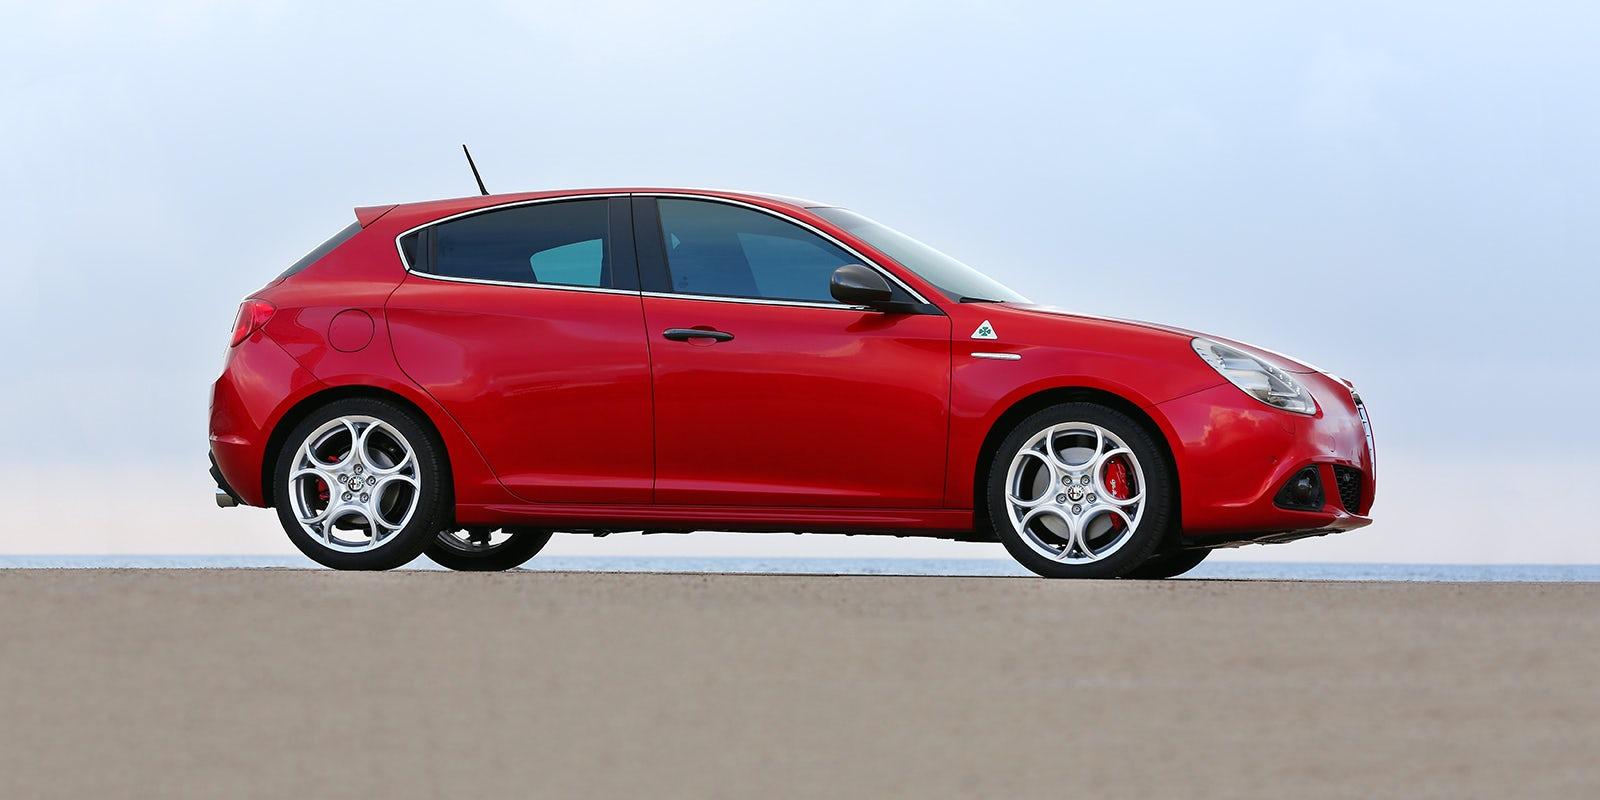 2017 Alfa Romeo Giulietta Price Specs And Release Date Carwow Modifications